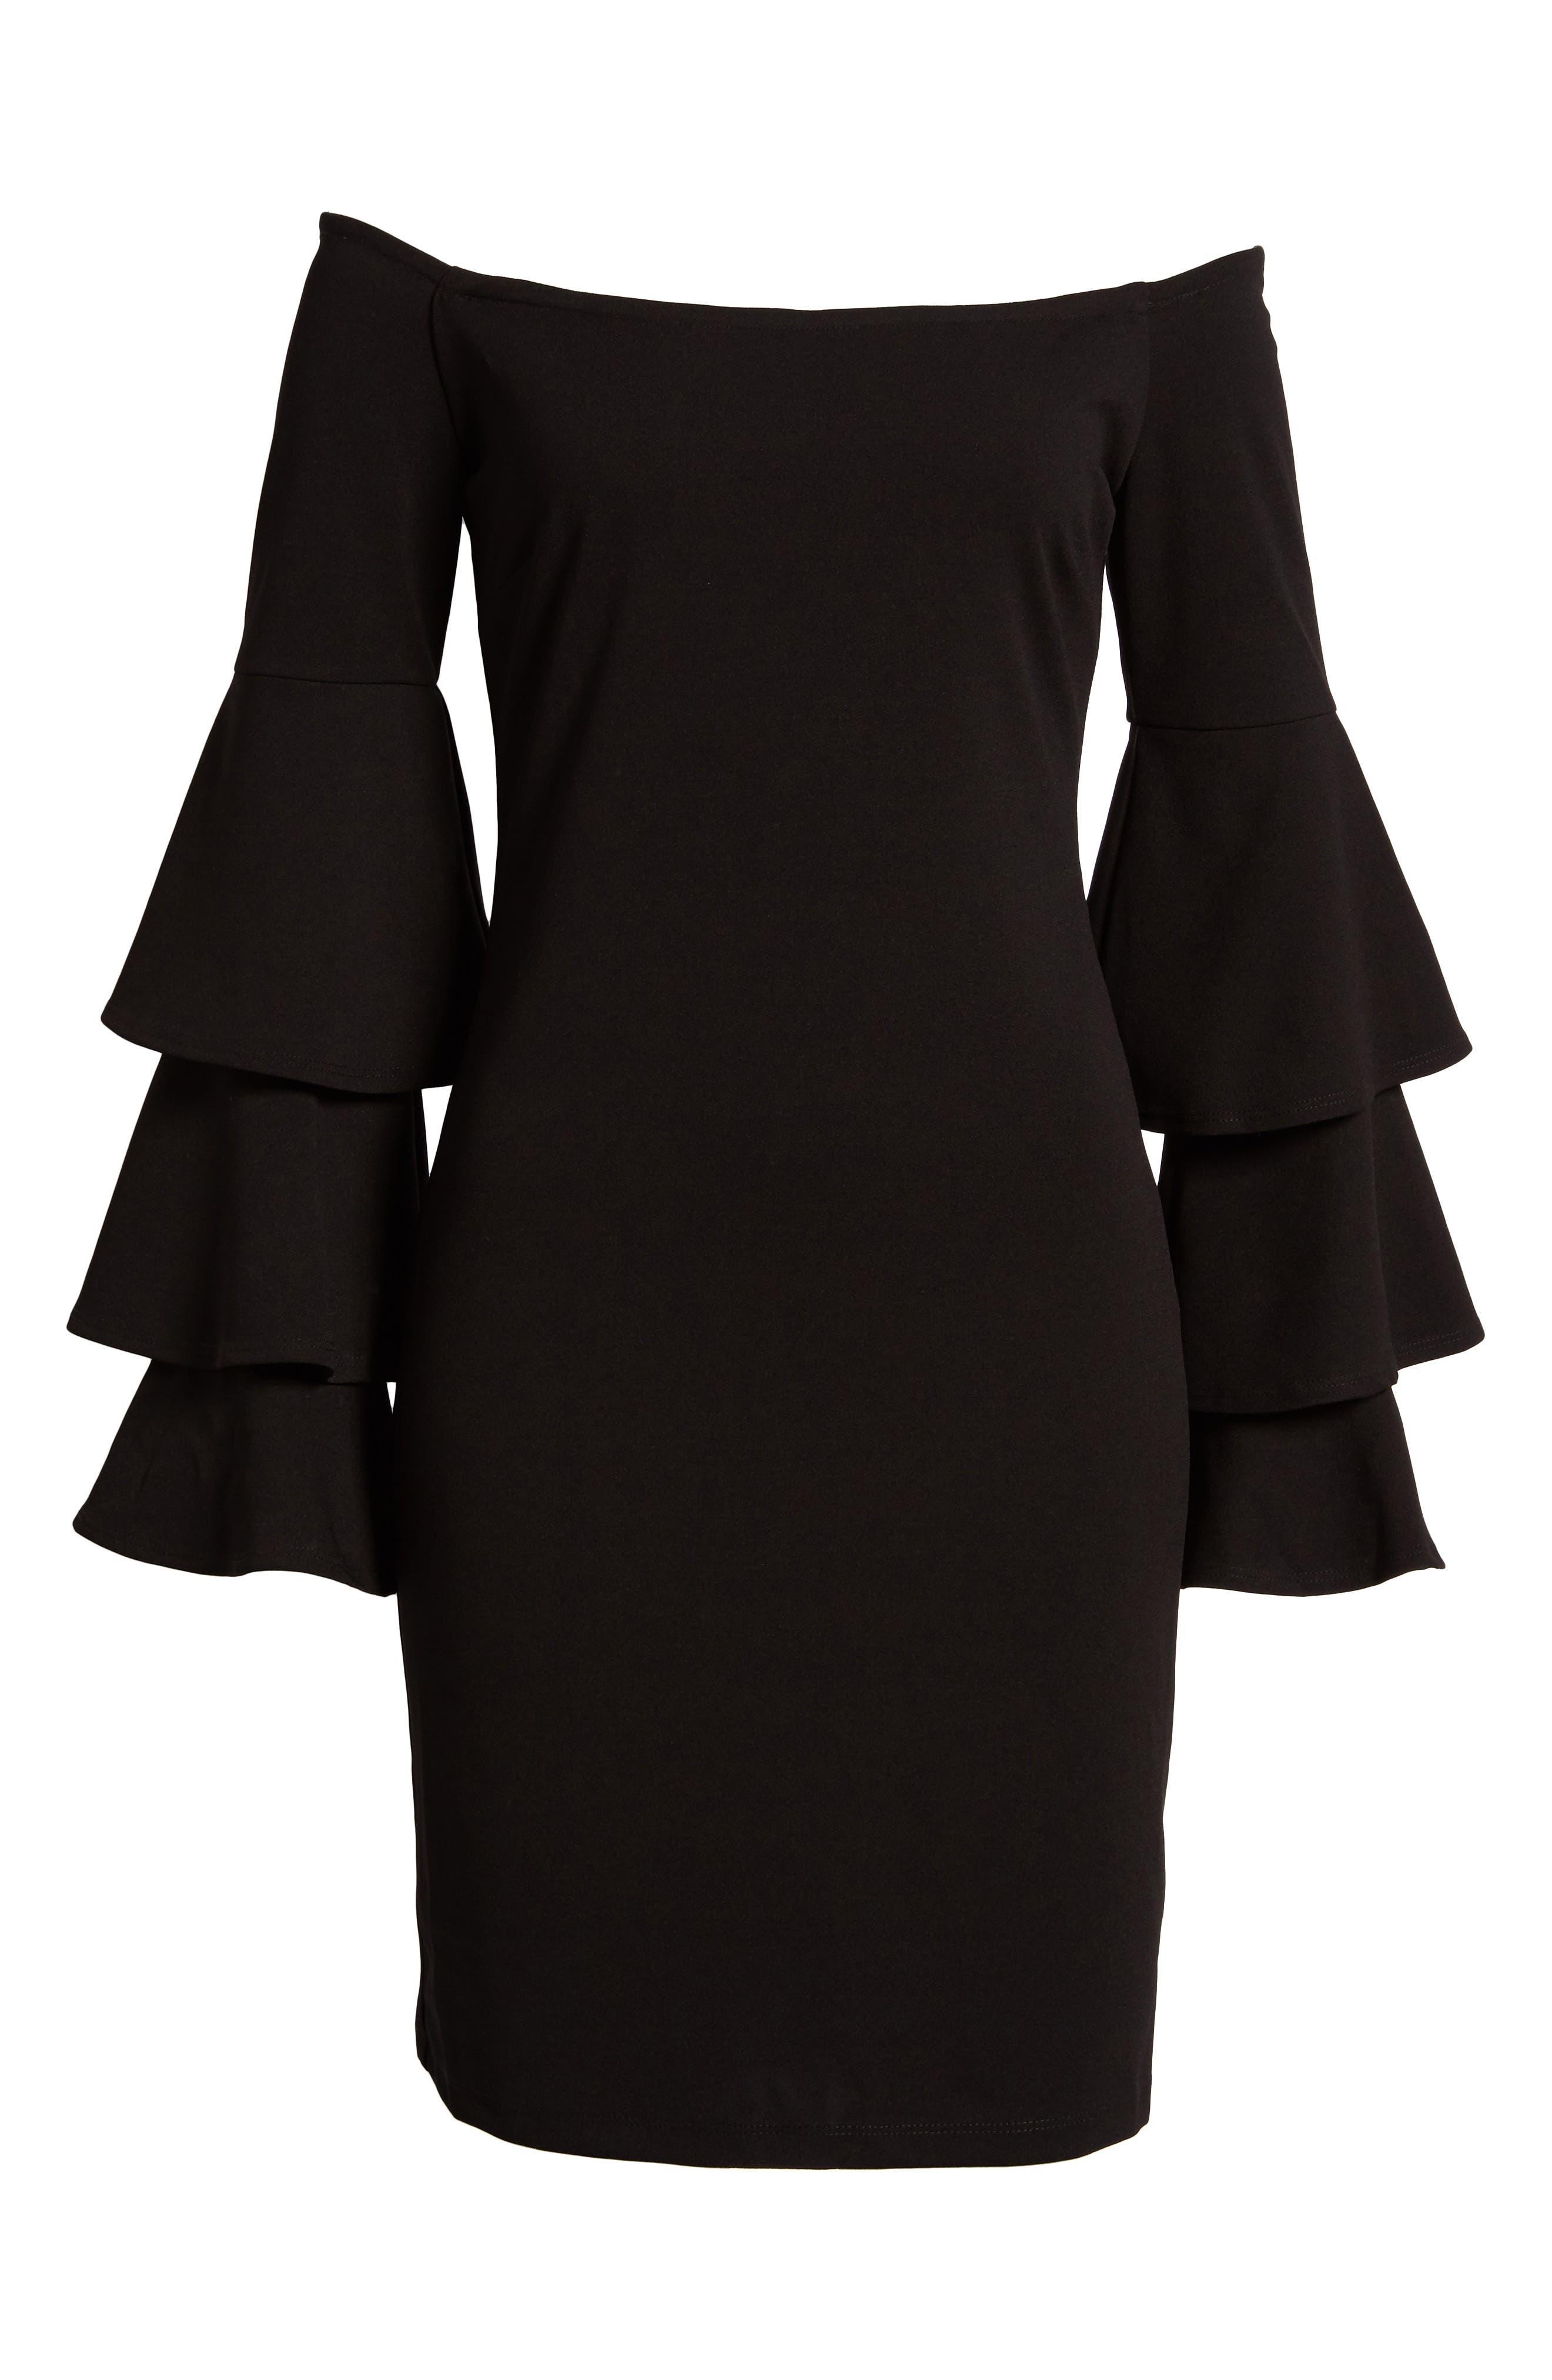 Ruffle Sleeve Off the Shoulder Dress,                             Alternate thumbnail 6, color,                             Black